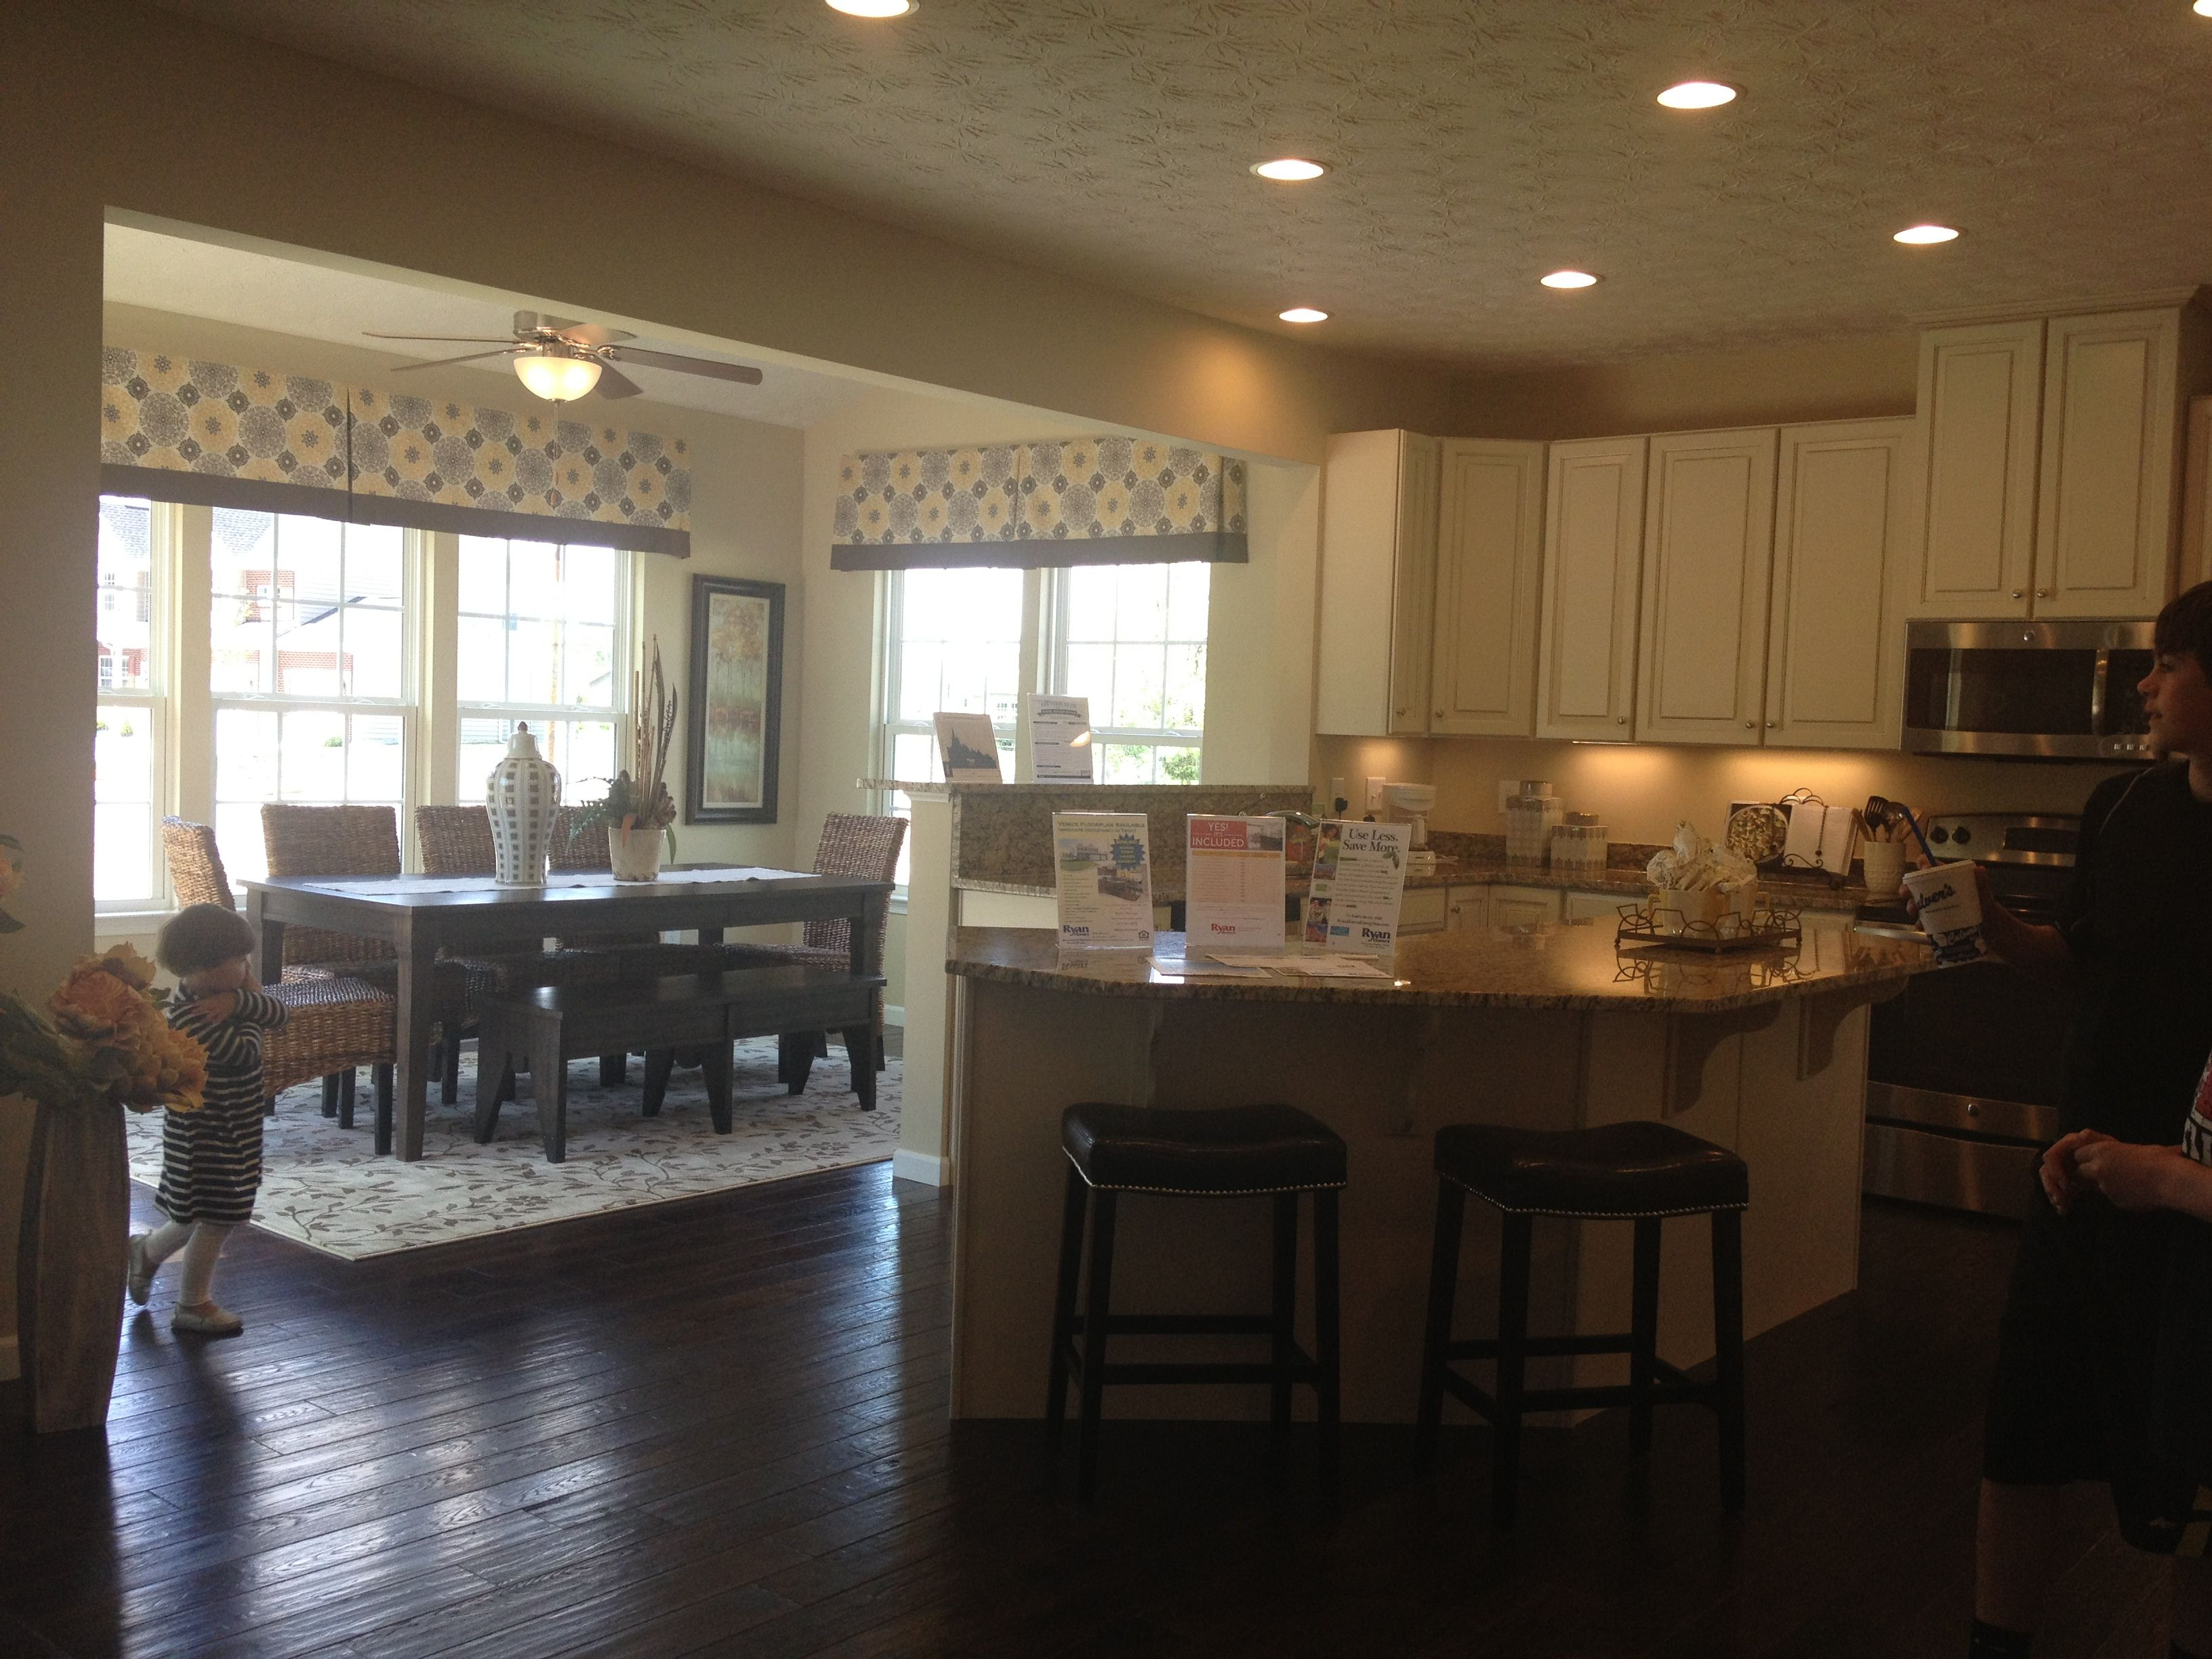 Morning Room Design Ideas Part - 23: Love The Kitchen U0026 Morning Room!